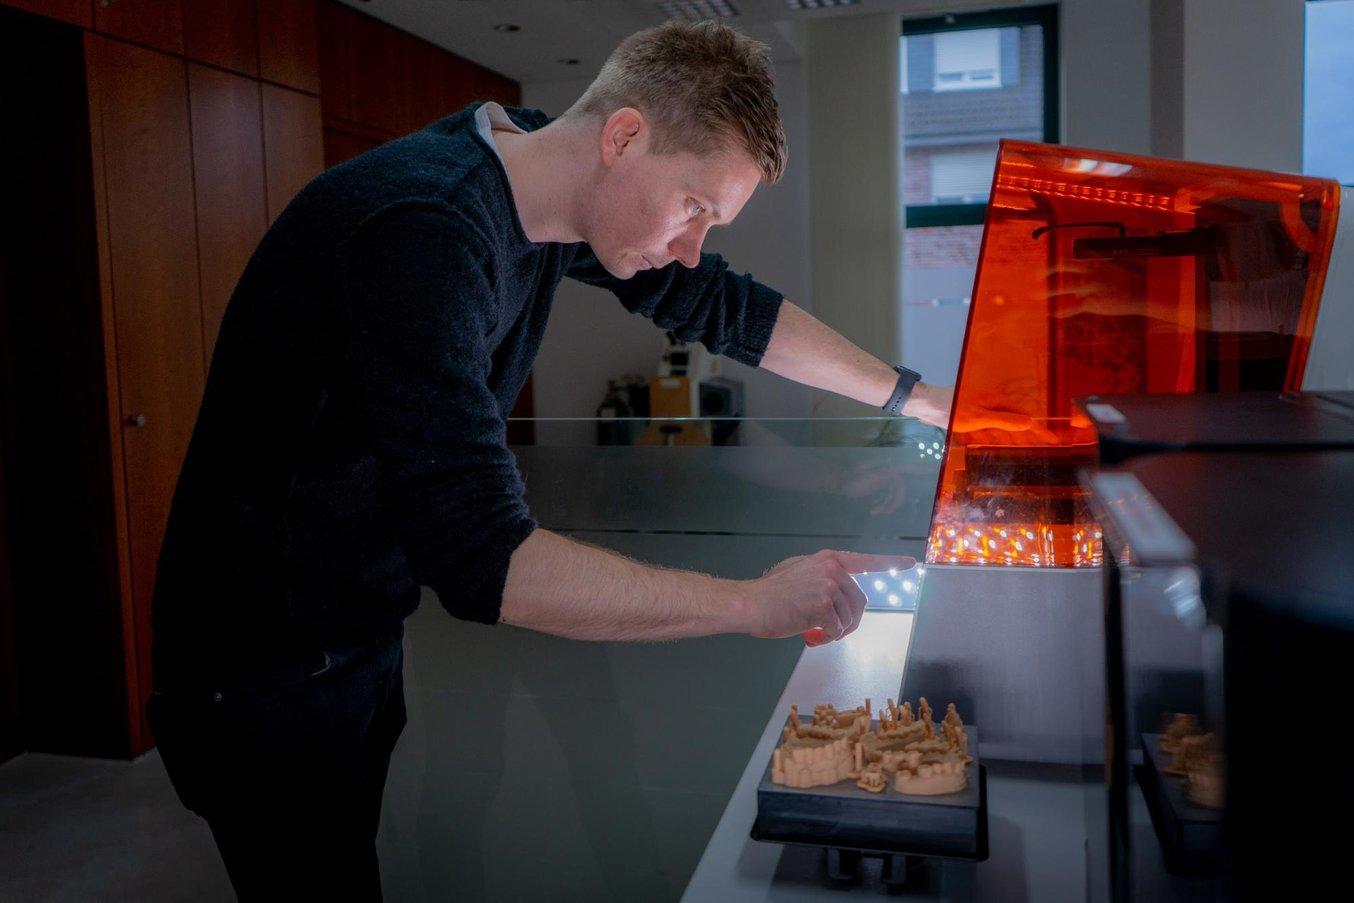 Stephan Kreimer utilizza una Form 3B nel suo laboratorio odontotecnico.